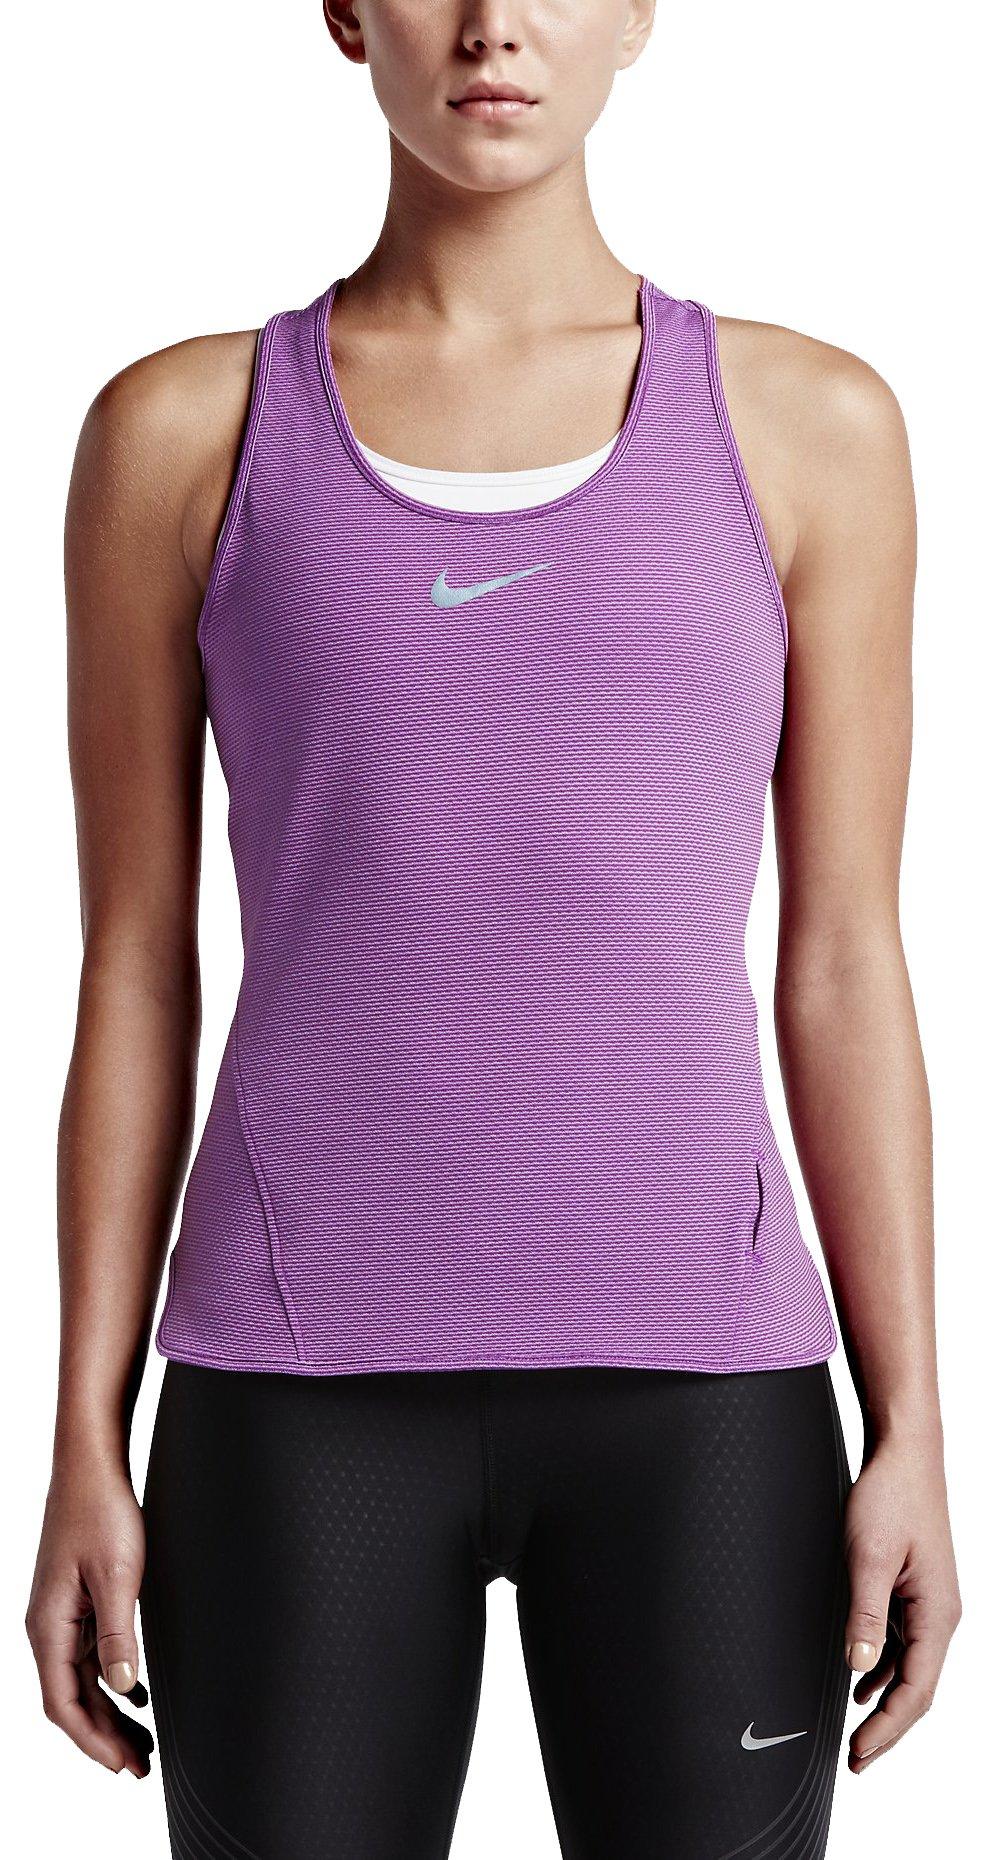 Běžecké tílko Nike AeroReact